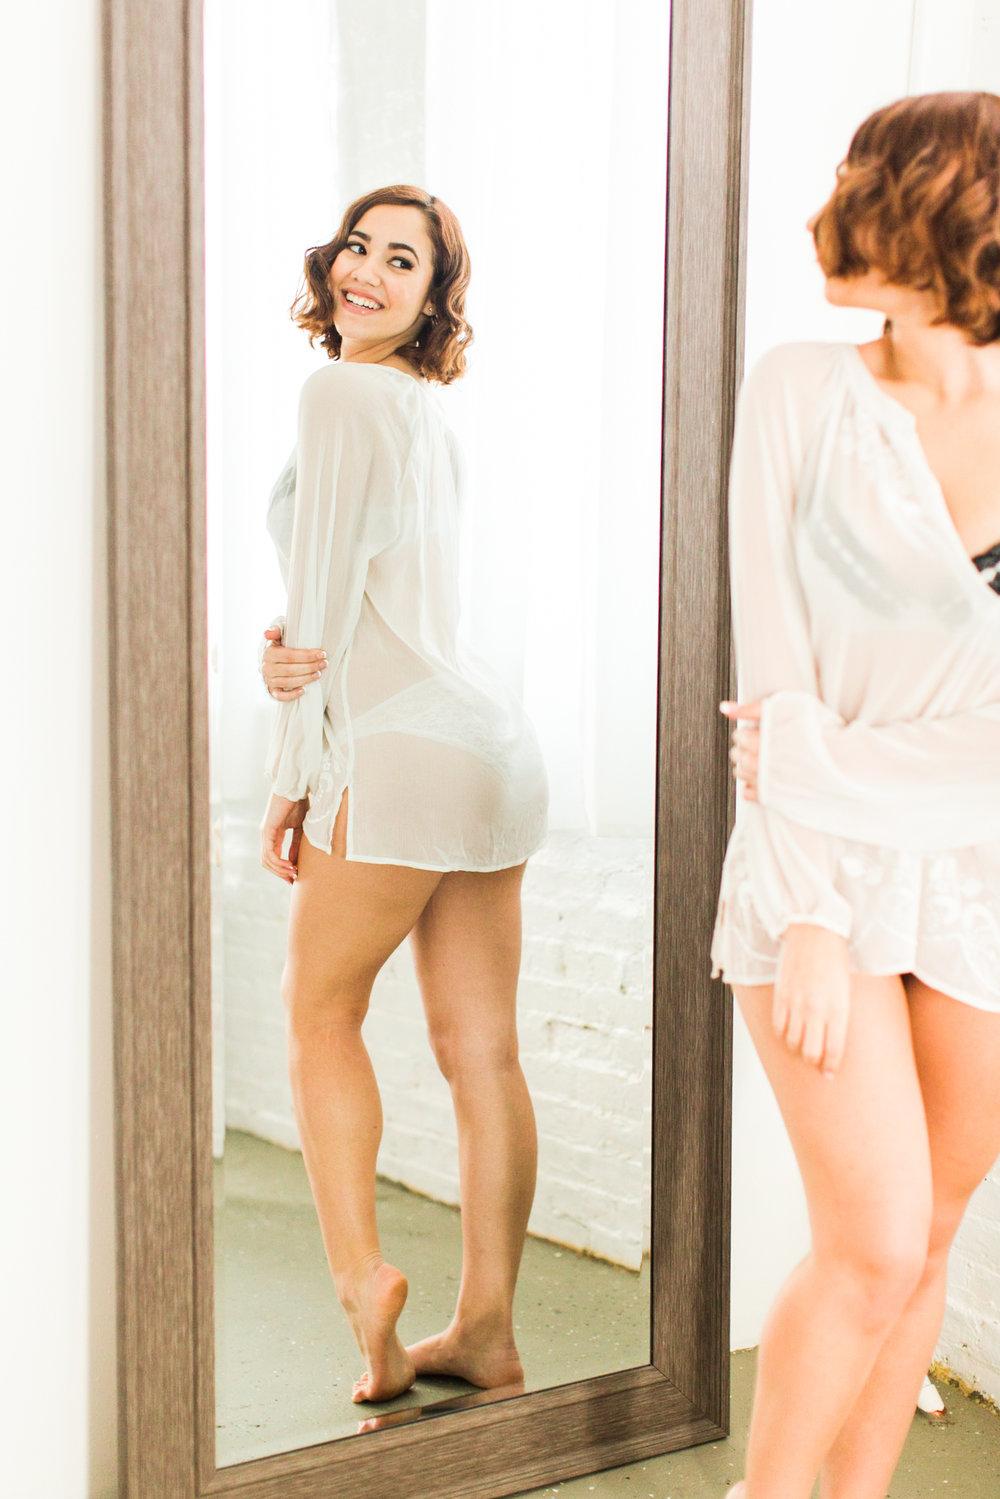 Bridal Boudoir - Shaina Lee Photography WEB-120.jpg